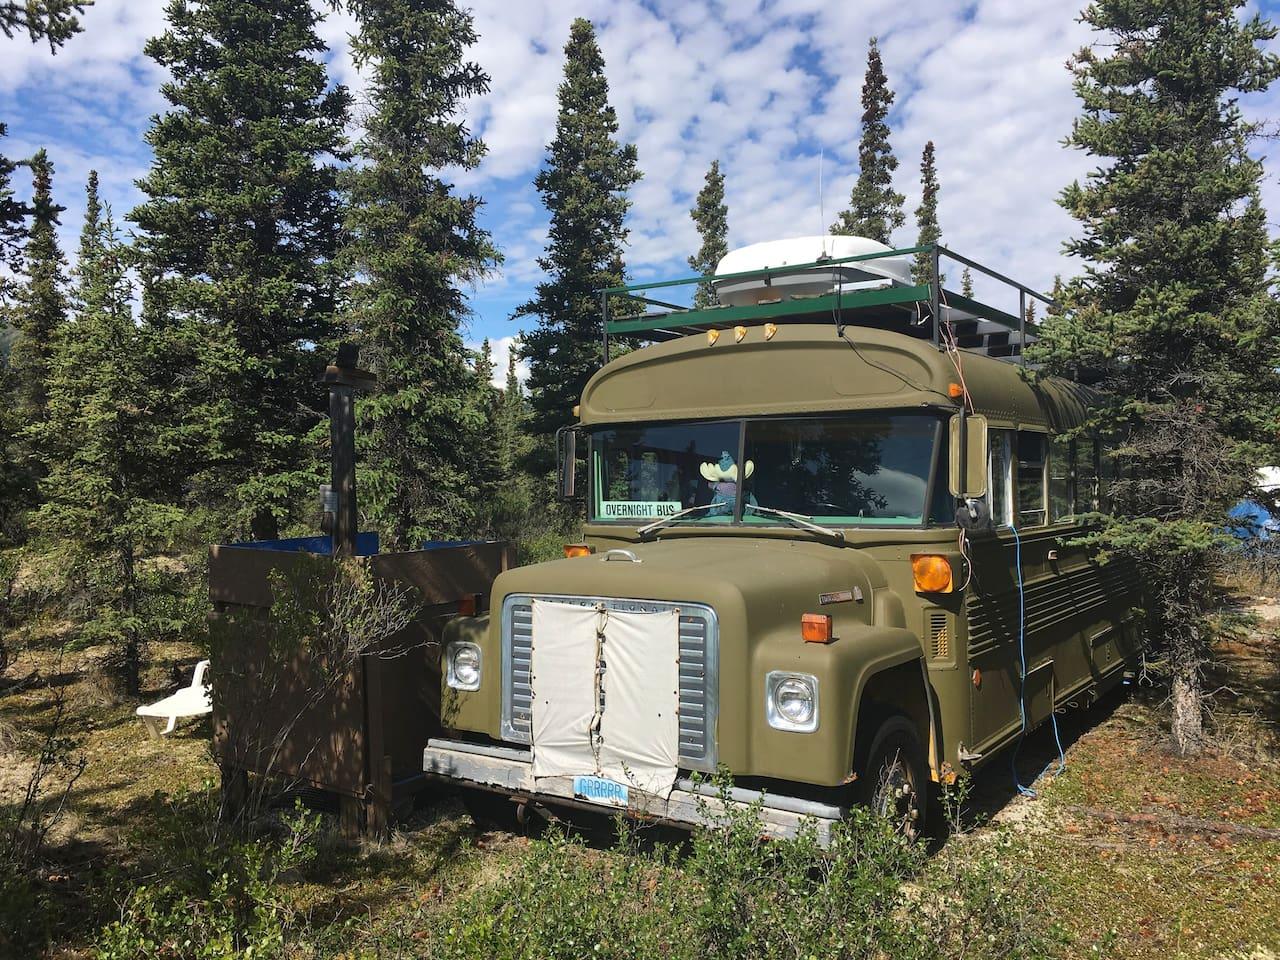 1979 Bluebird School bus Converted, Airbnb